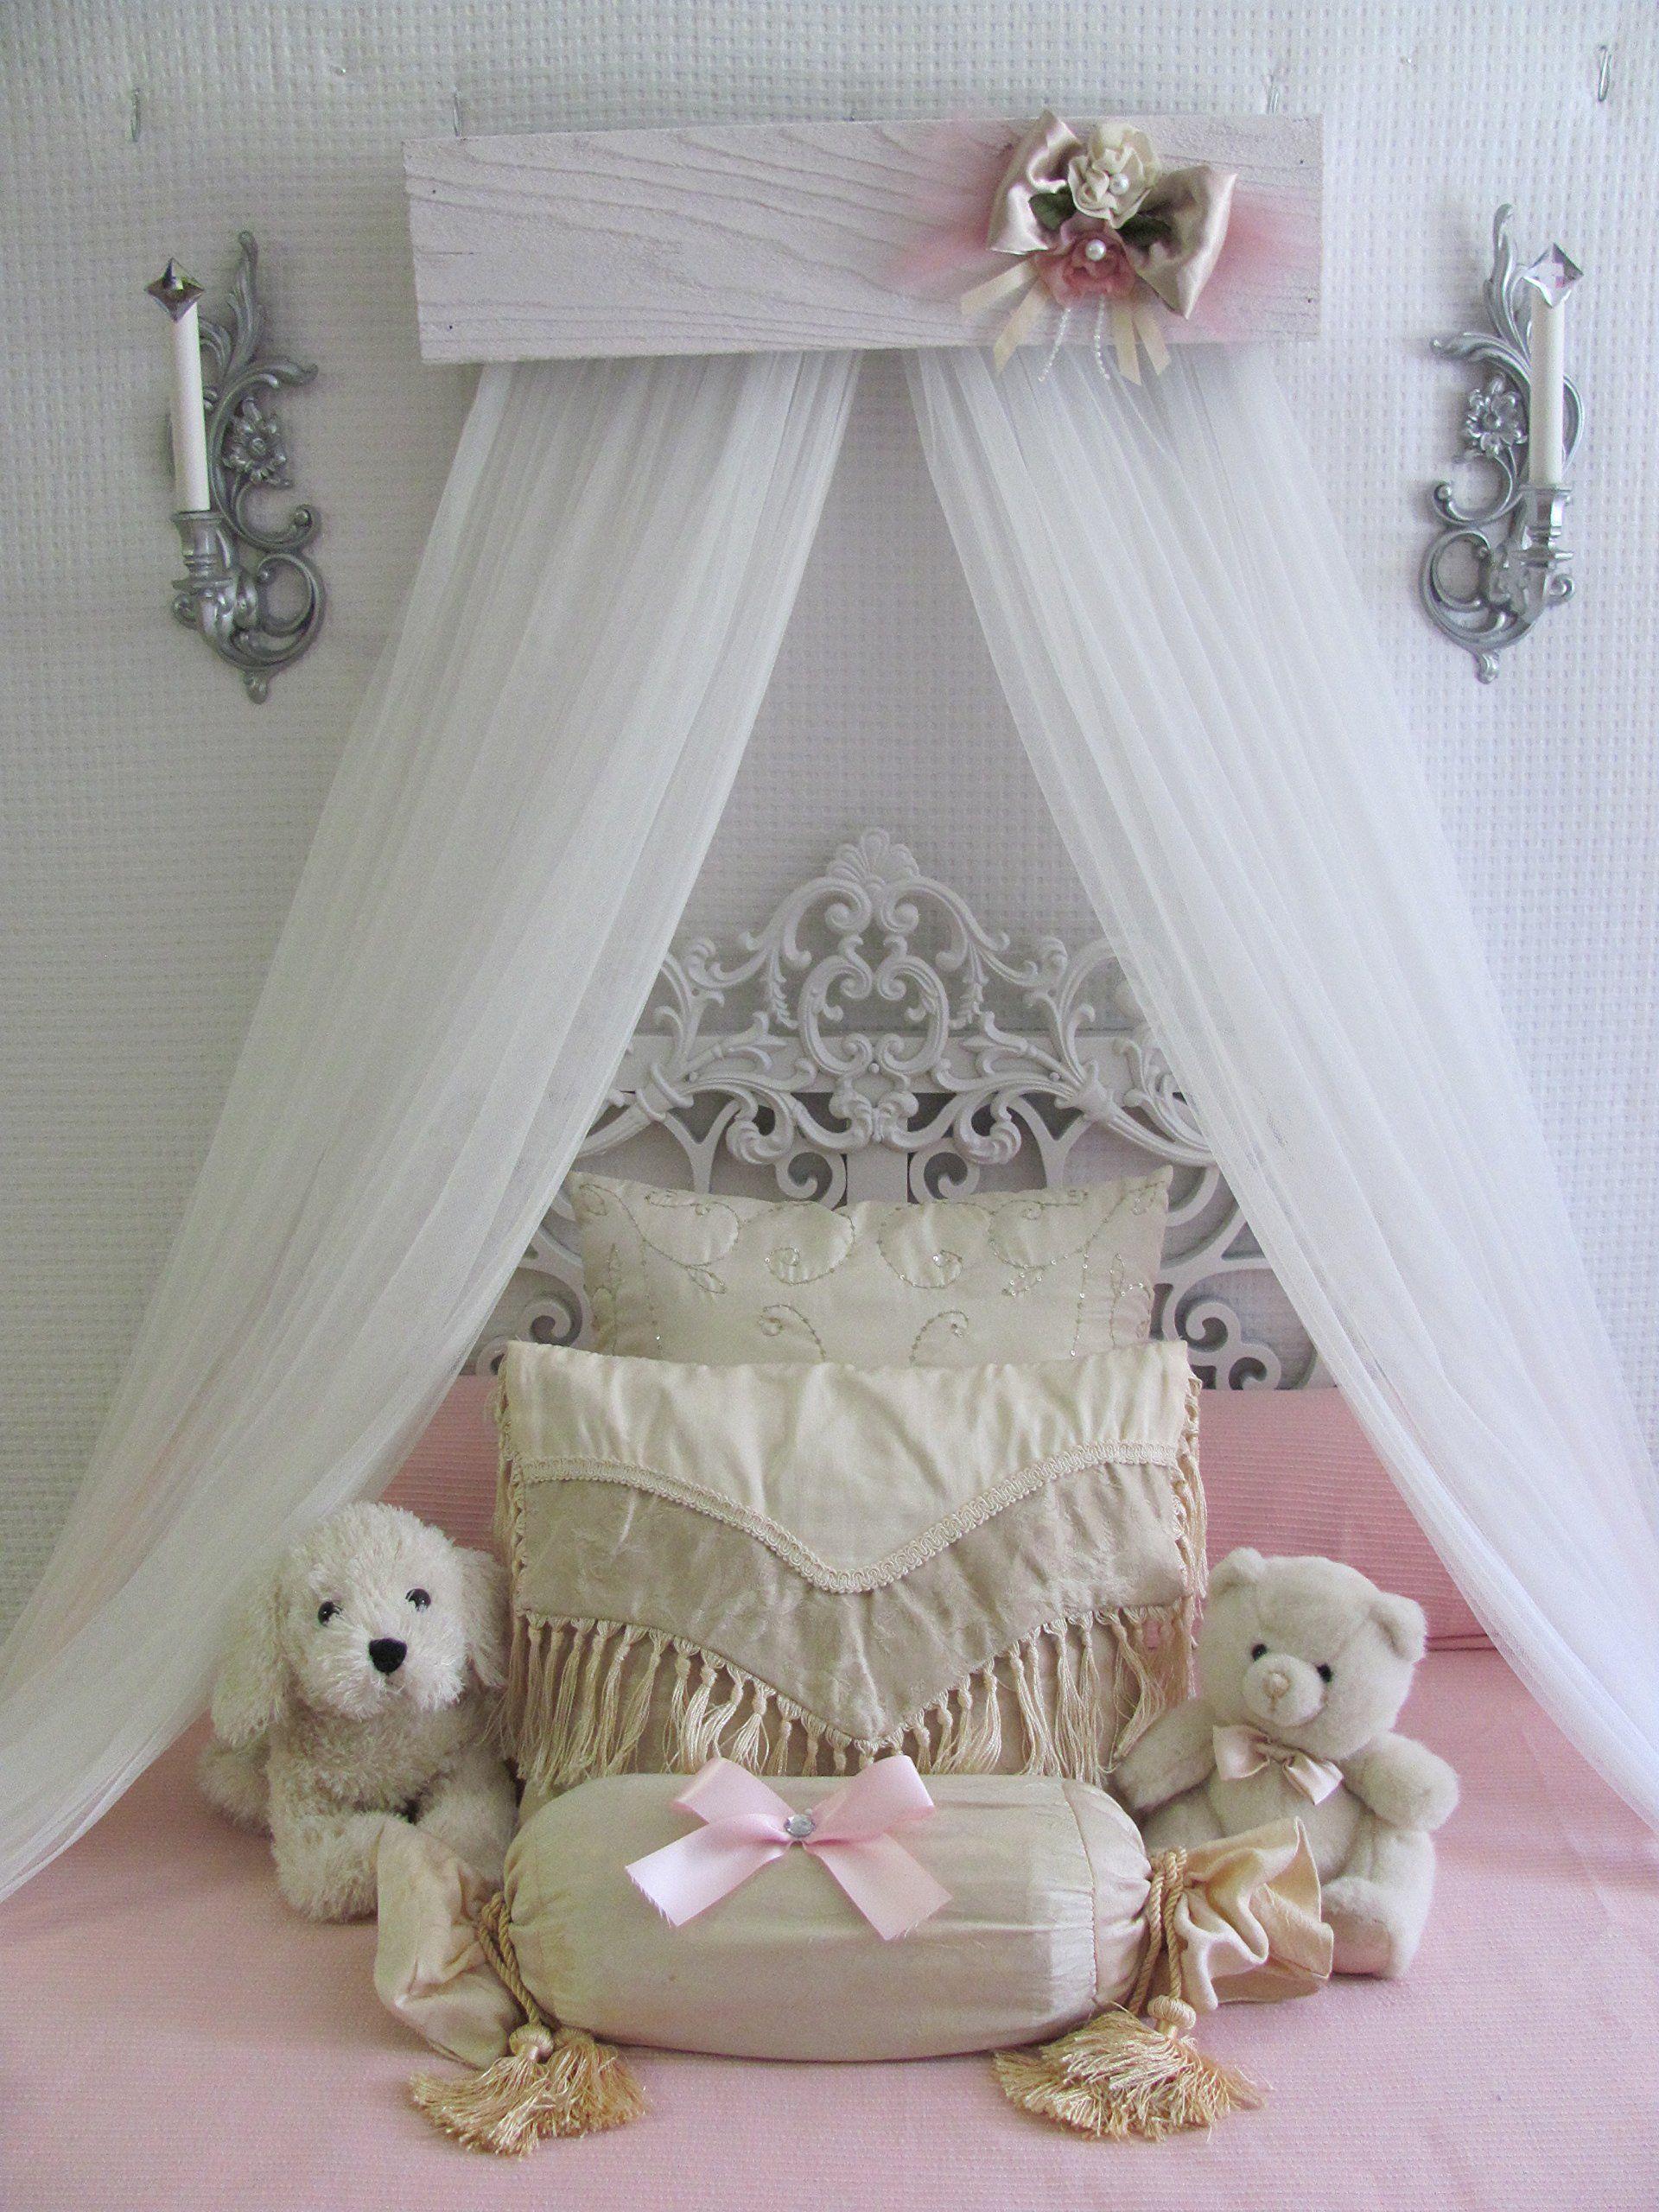 Princess Bed Crown Canopy Crib Baby Nursery Decor Shabby Chic Princess Girlu0027s Bedroom FREE White curtains & Princess Bed Crown Canopy Crib Baby Nursery Decor Shabby Chic ...